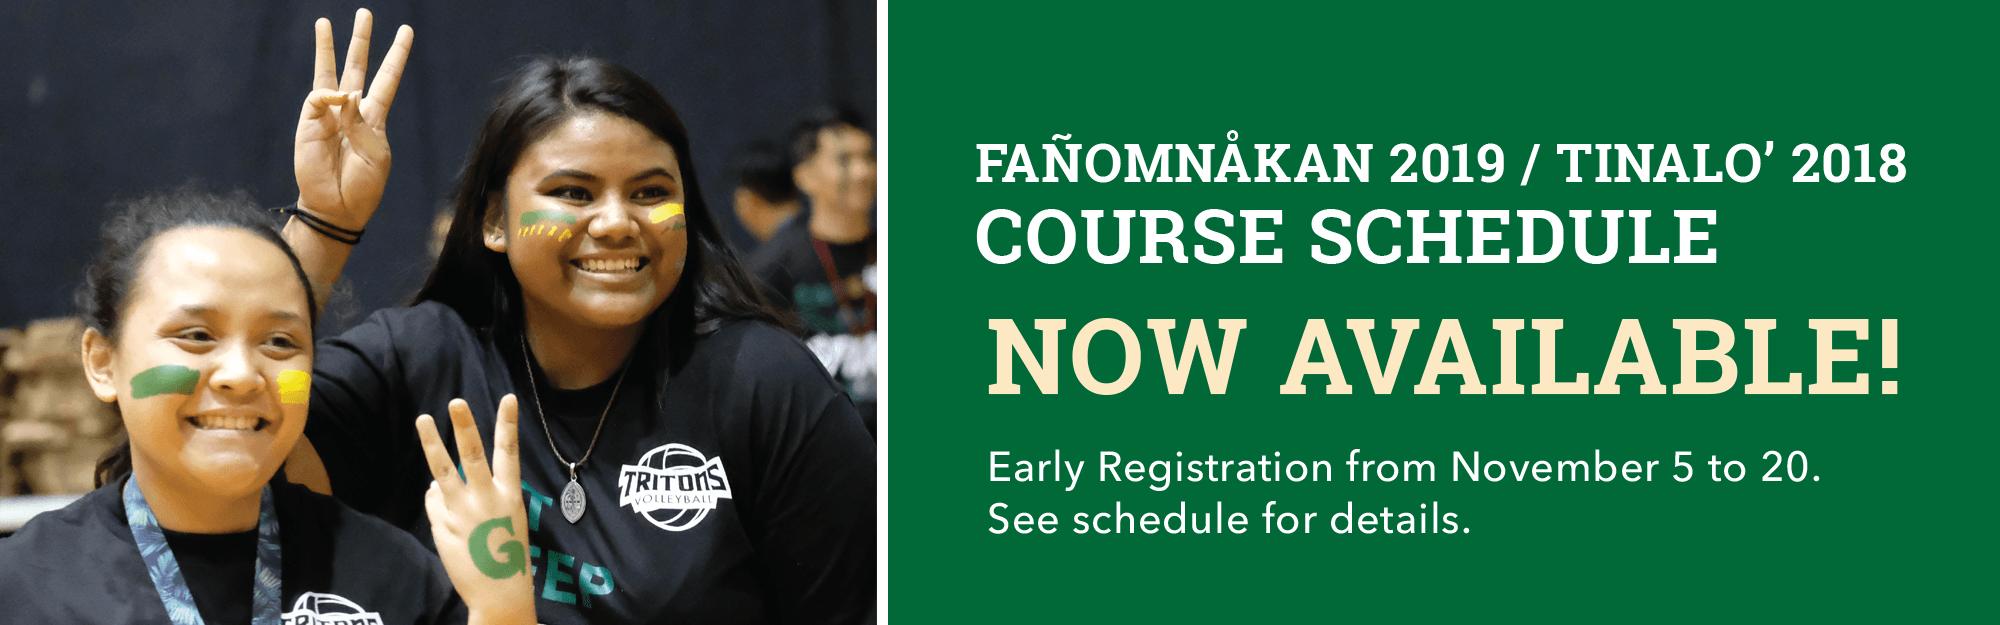 Fañomnåkan 2018 Course Schedule